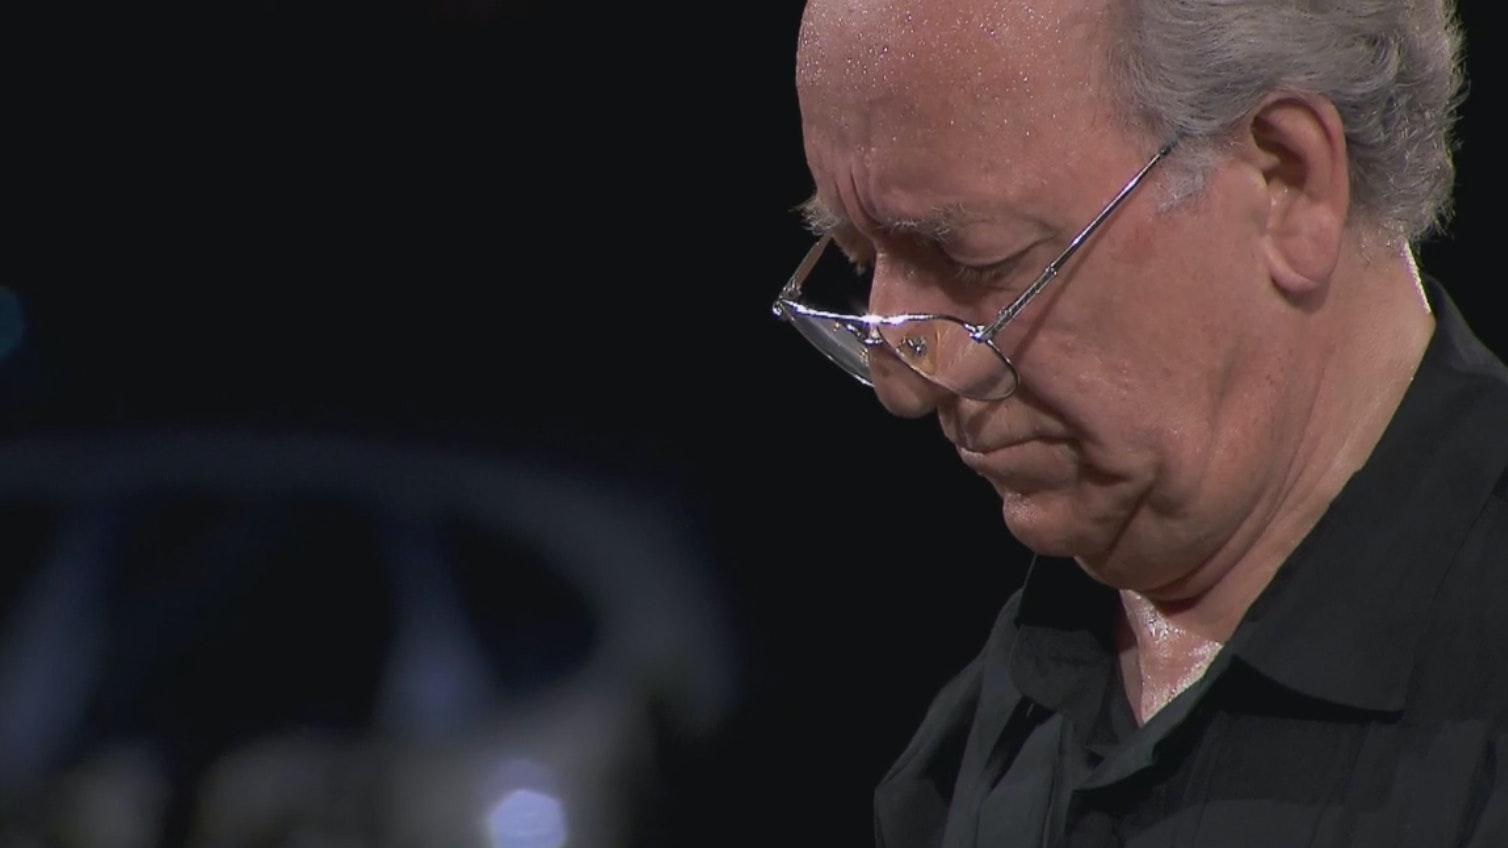 Yuri Temirkanov conducts Mussorgsky and Elgar